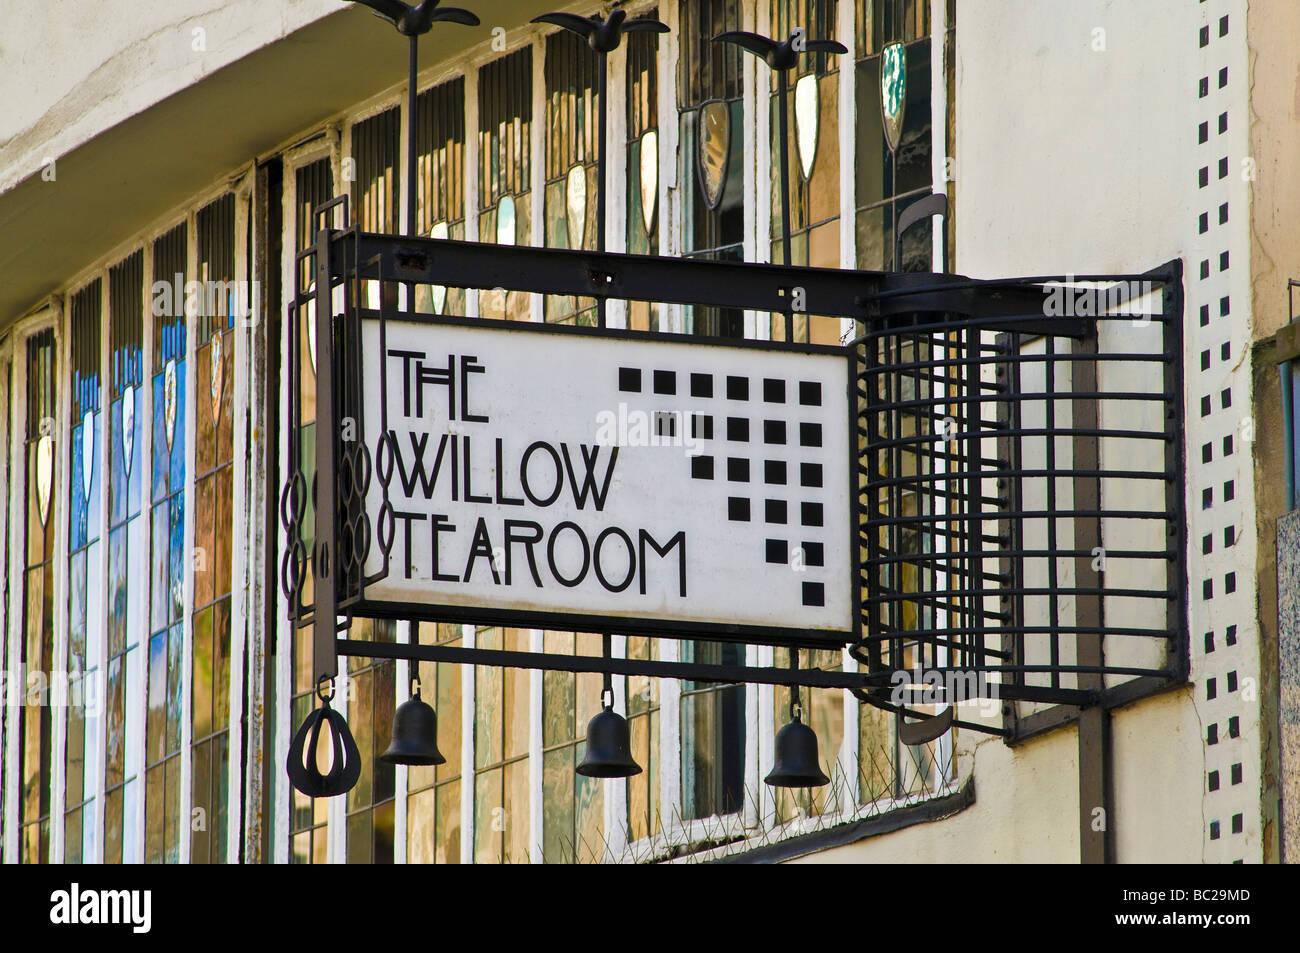 dh  SAUCHIEHALL STREET GLASGOW Tea room The Willow tearooms sign Charles Rennie Mackintosh design macintosh restaurant tearoom scotland Stock Photo